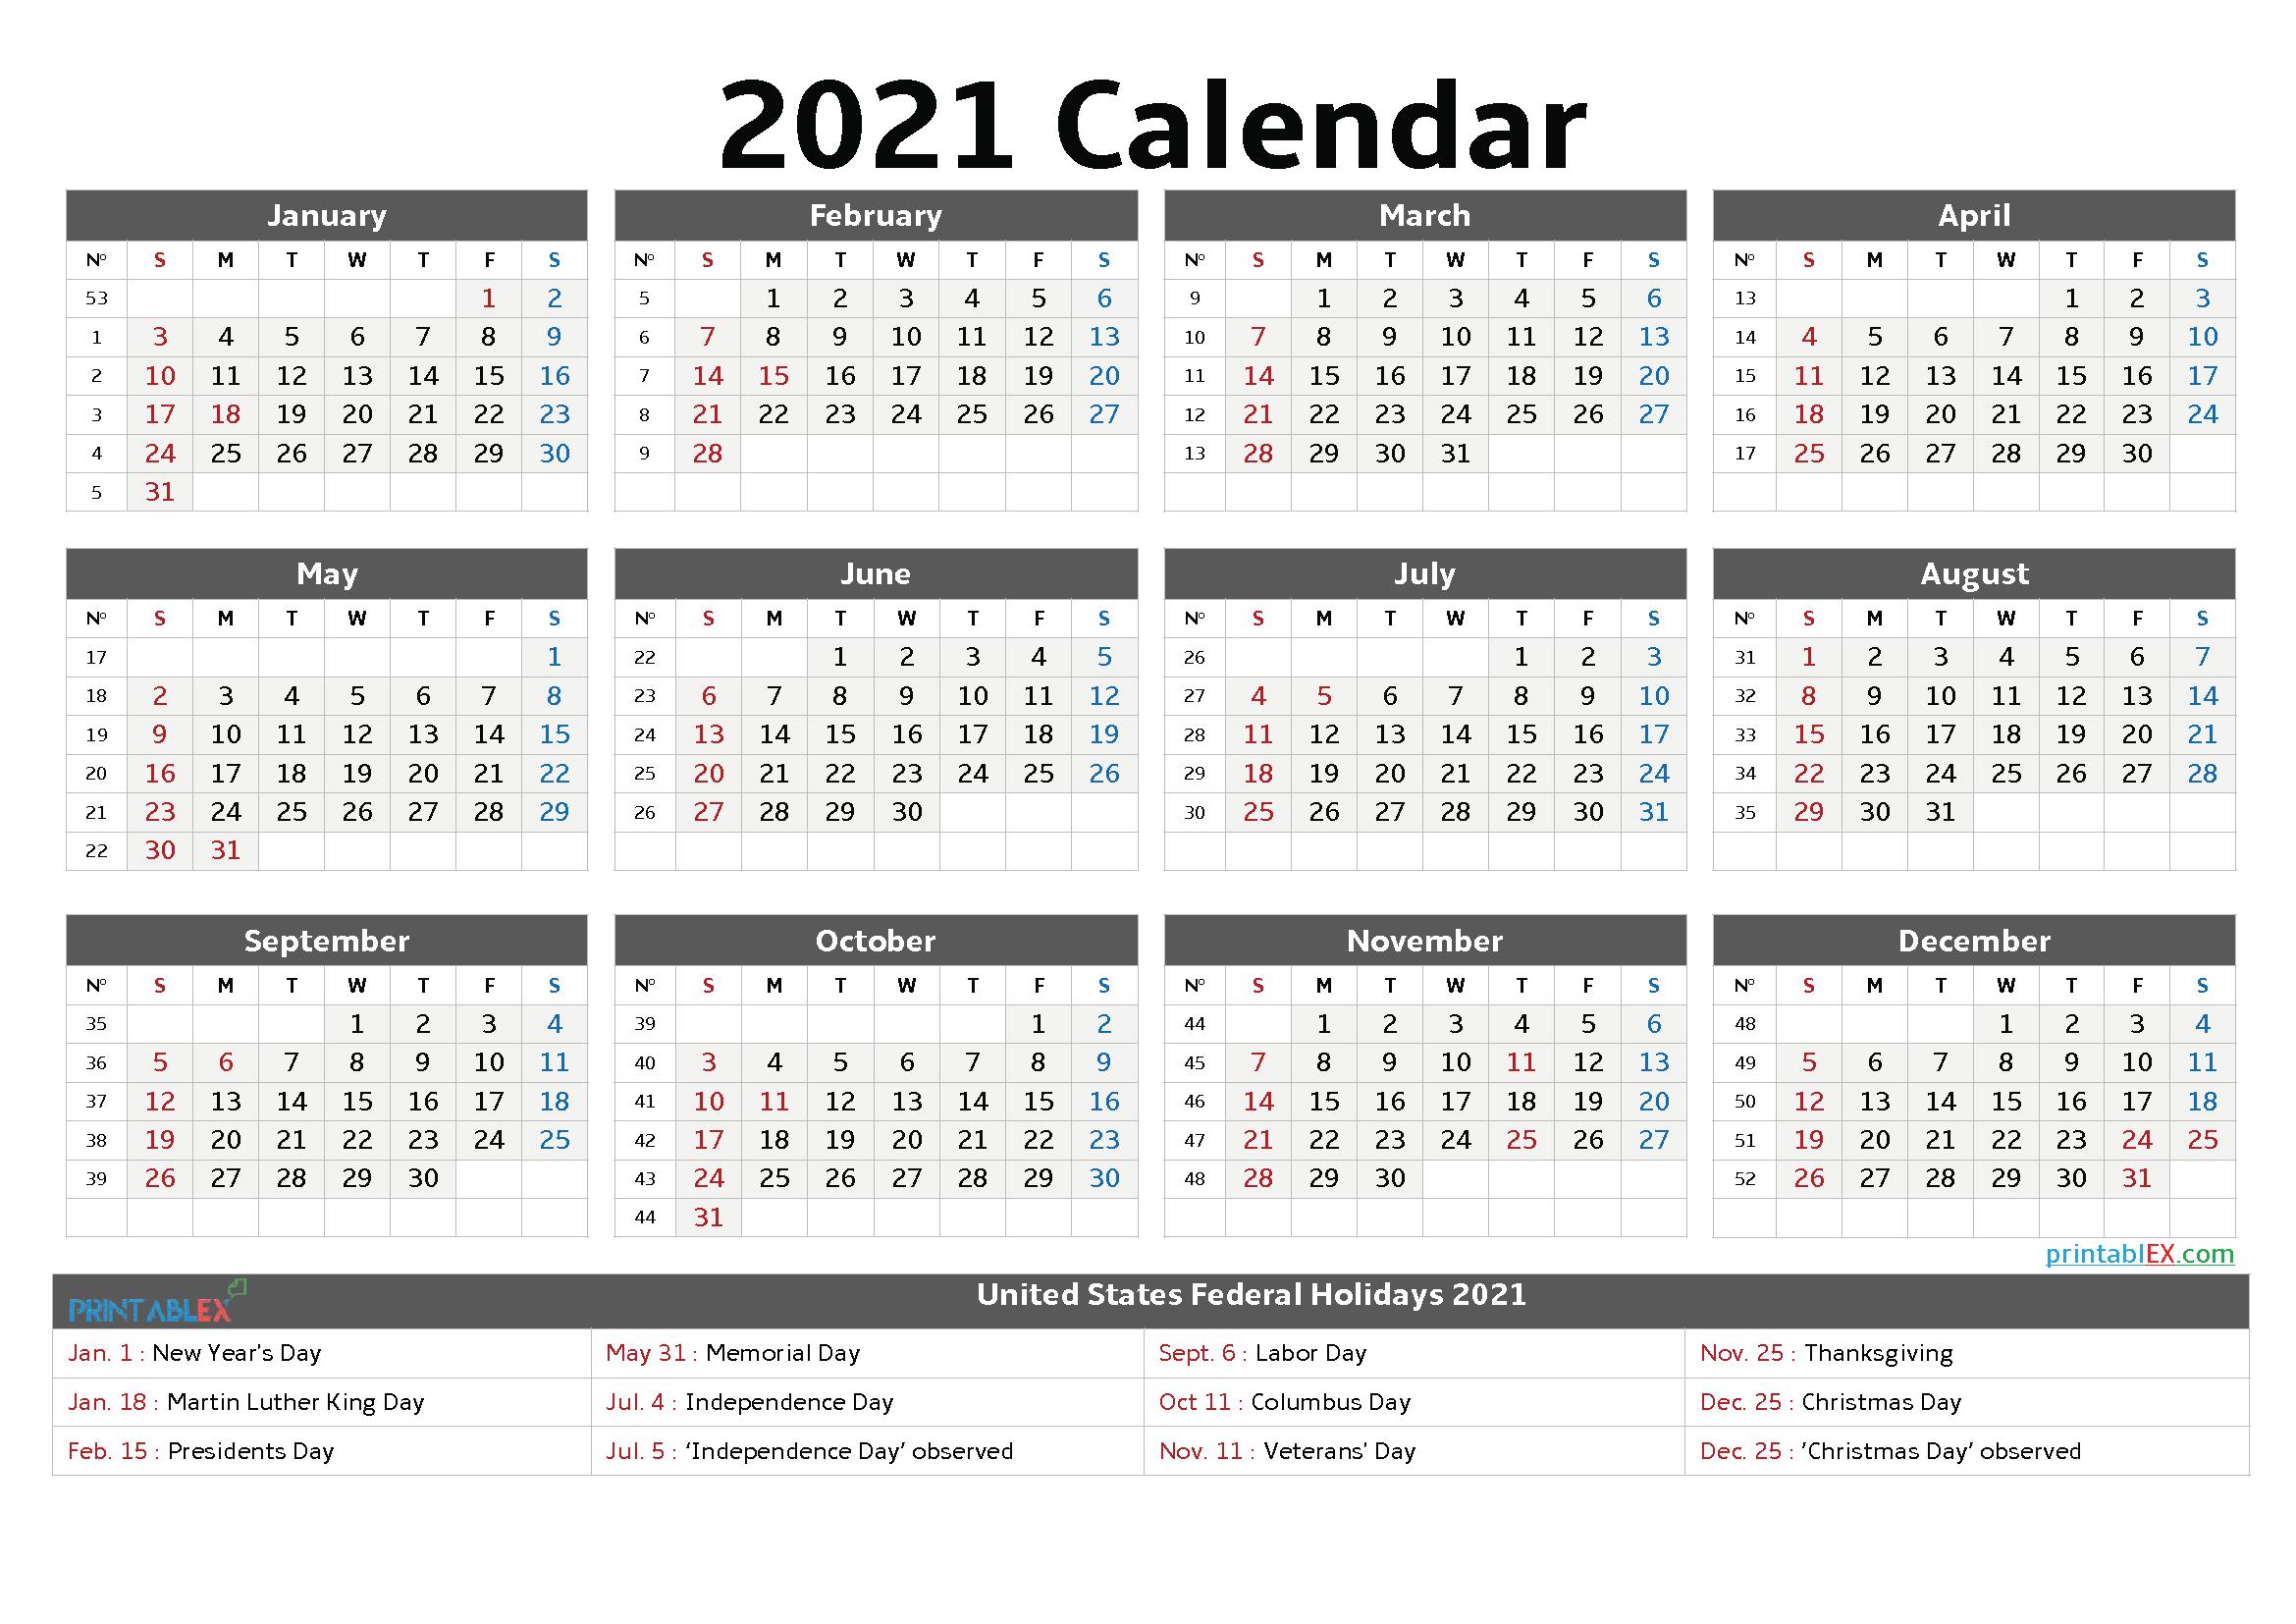 2021 Holidays List Printable